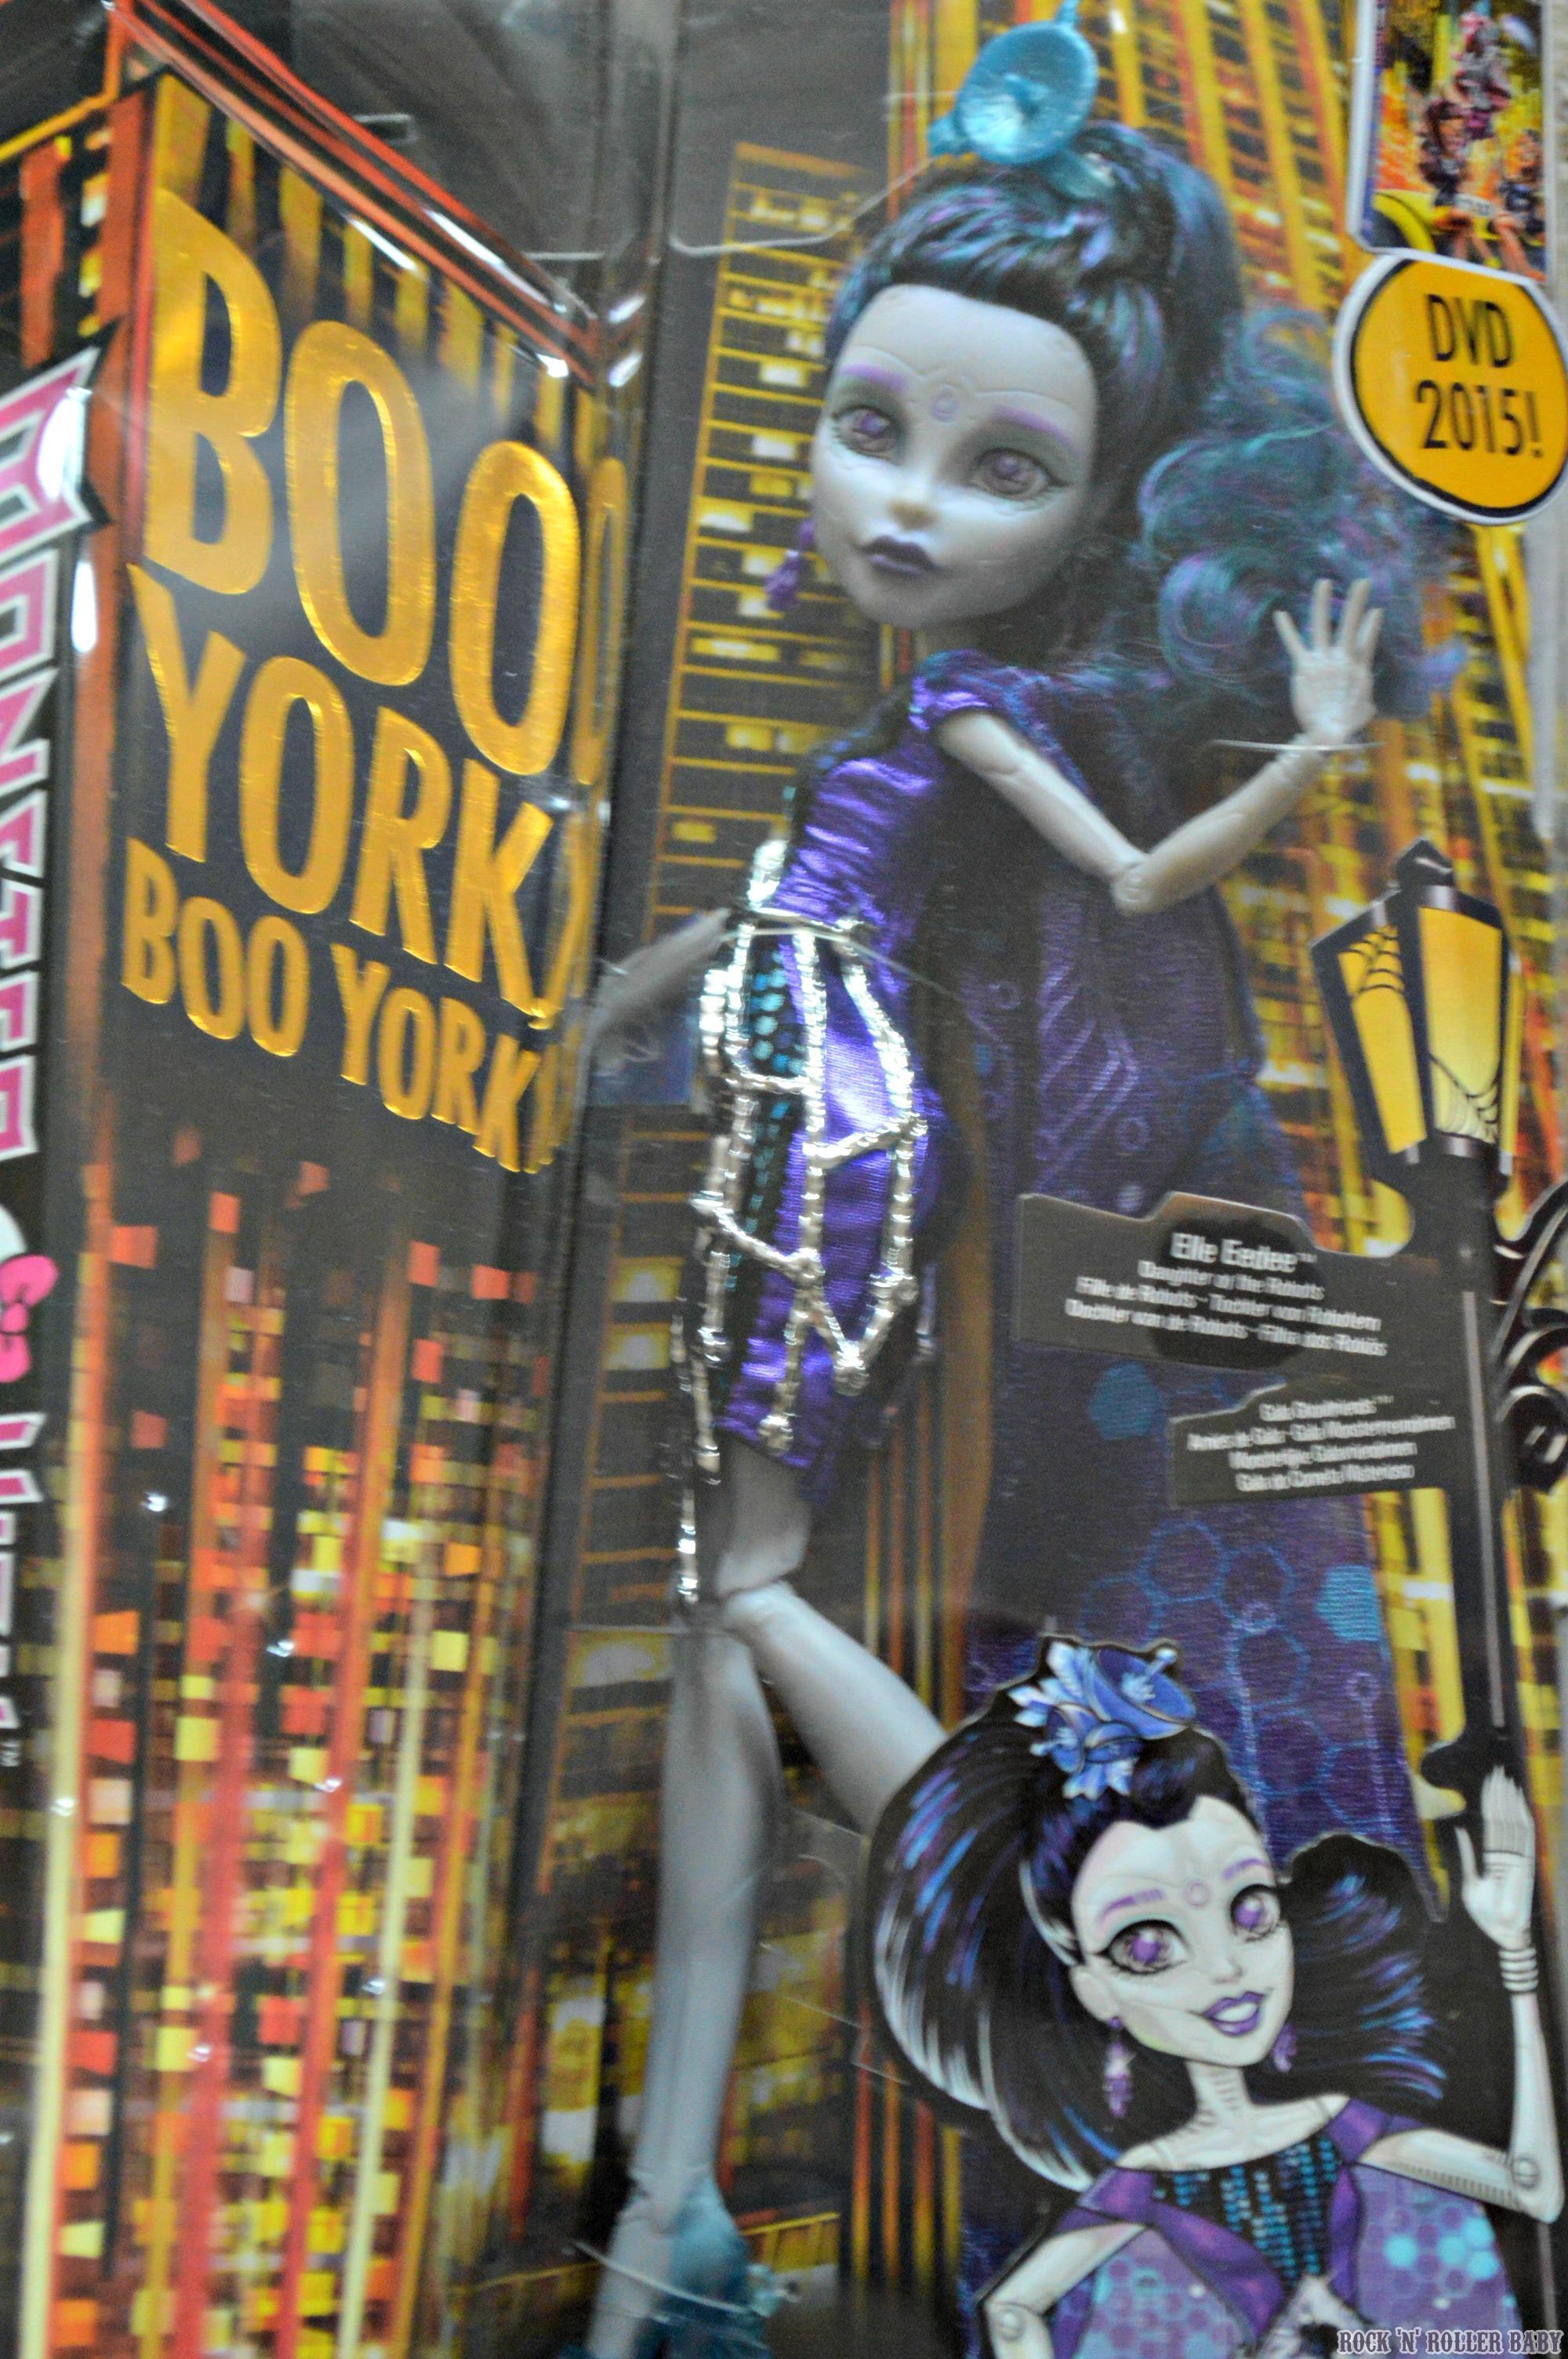 boo york boo york  a monster high review  rocknrollerbaby